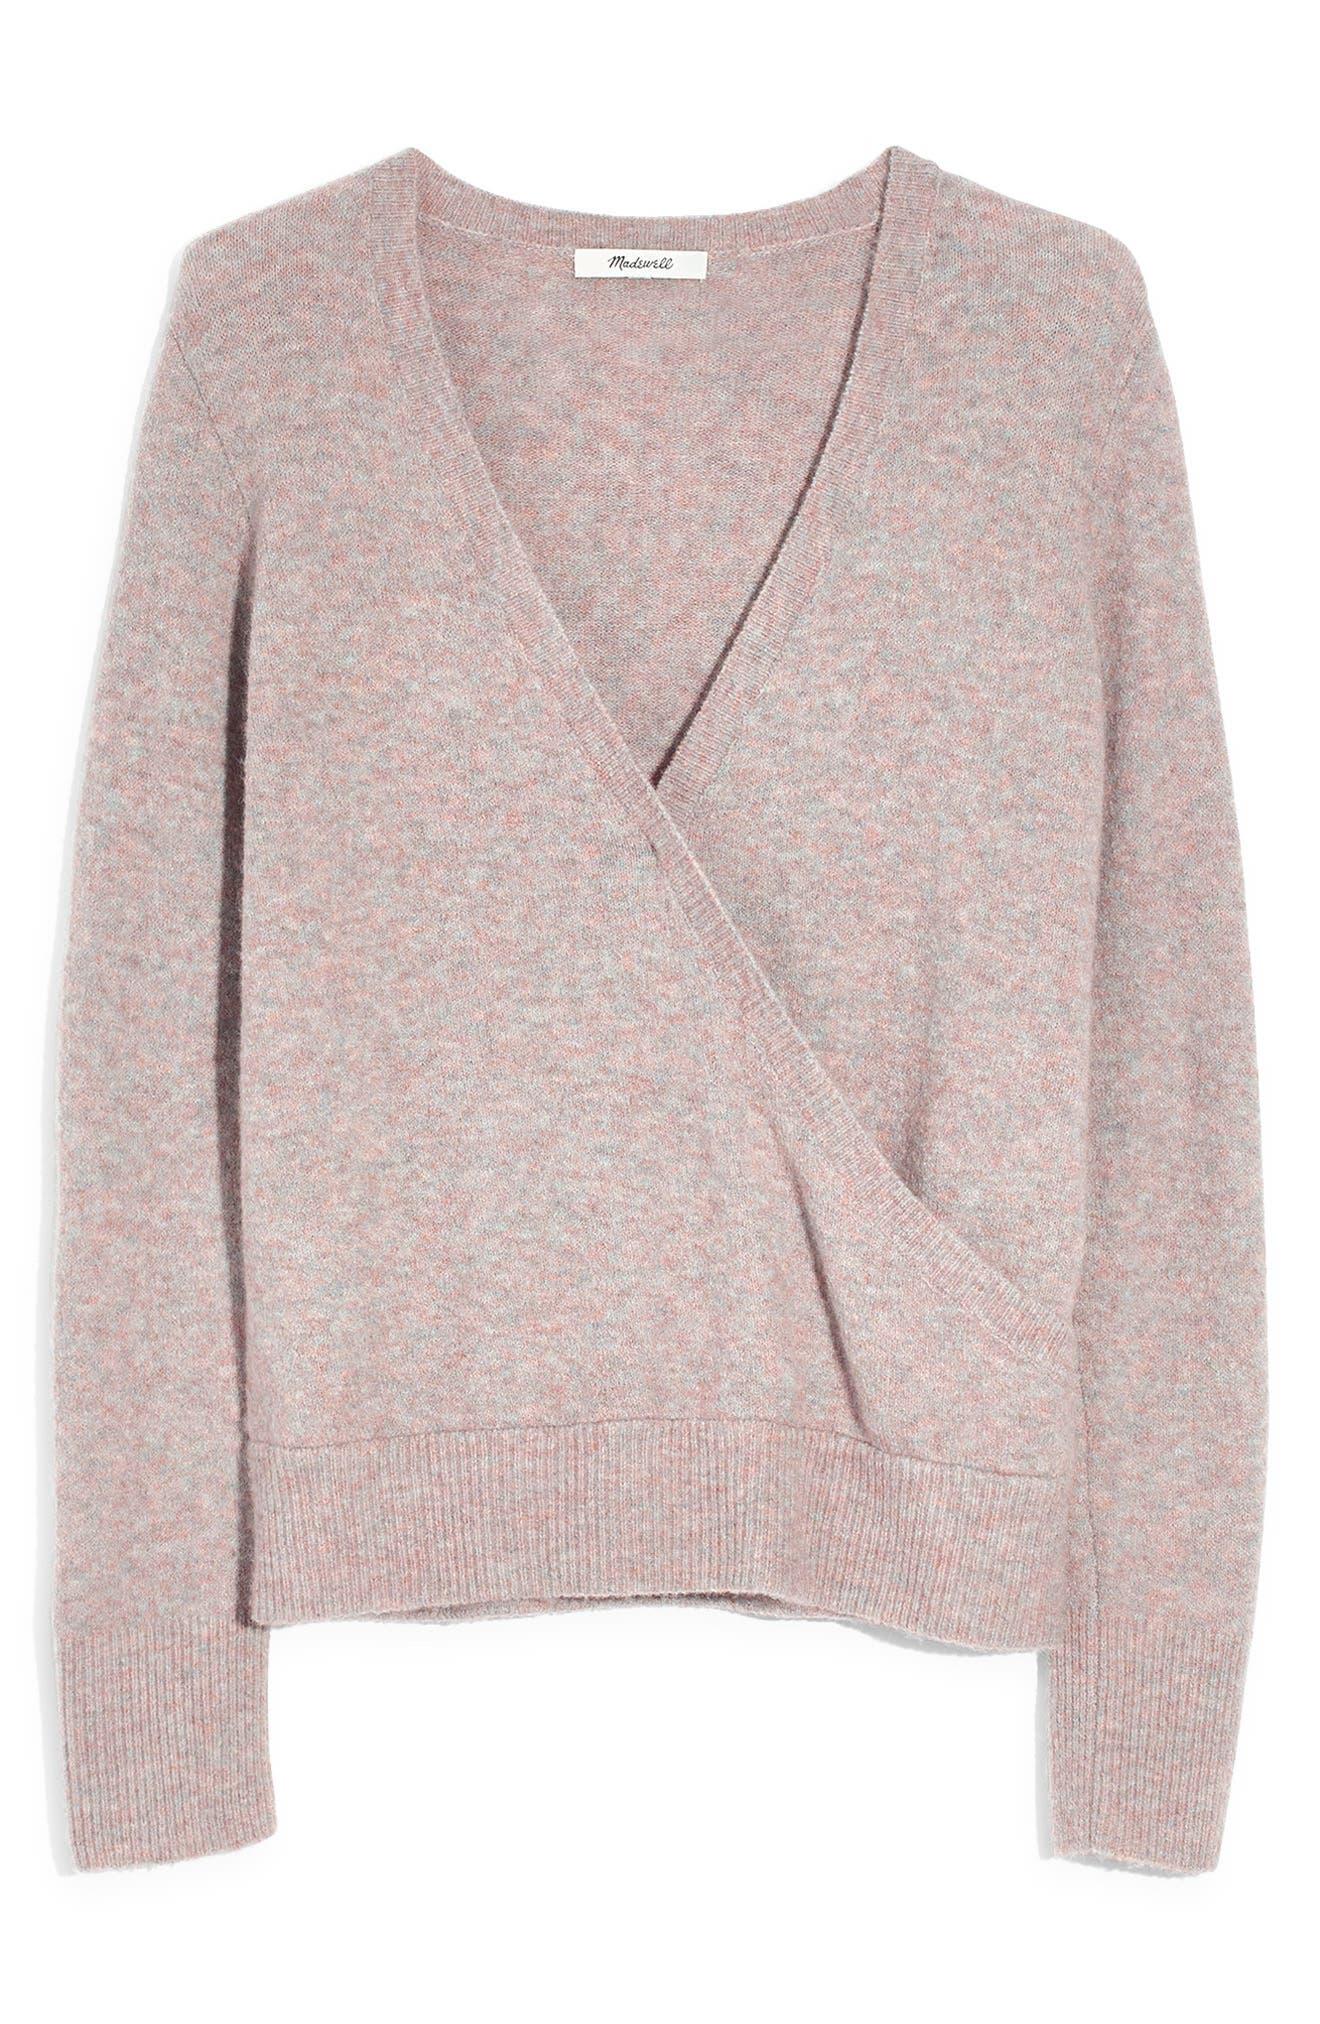 aaff9795d9 Women s Madewell Sweaters